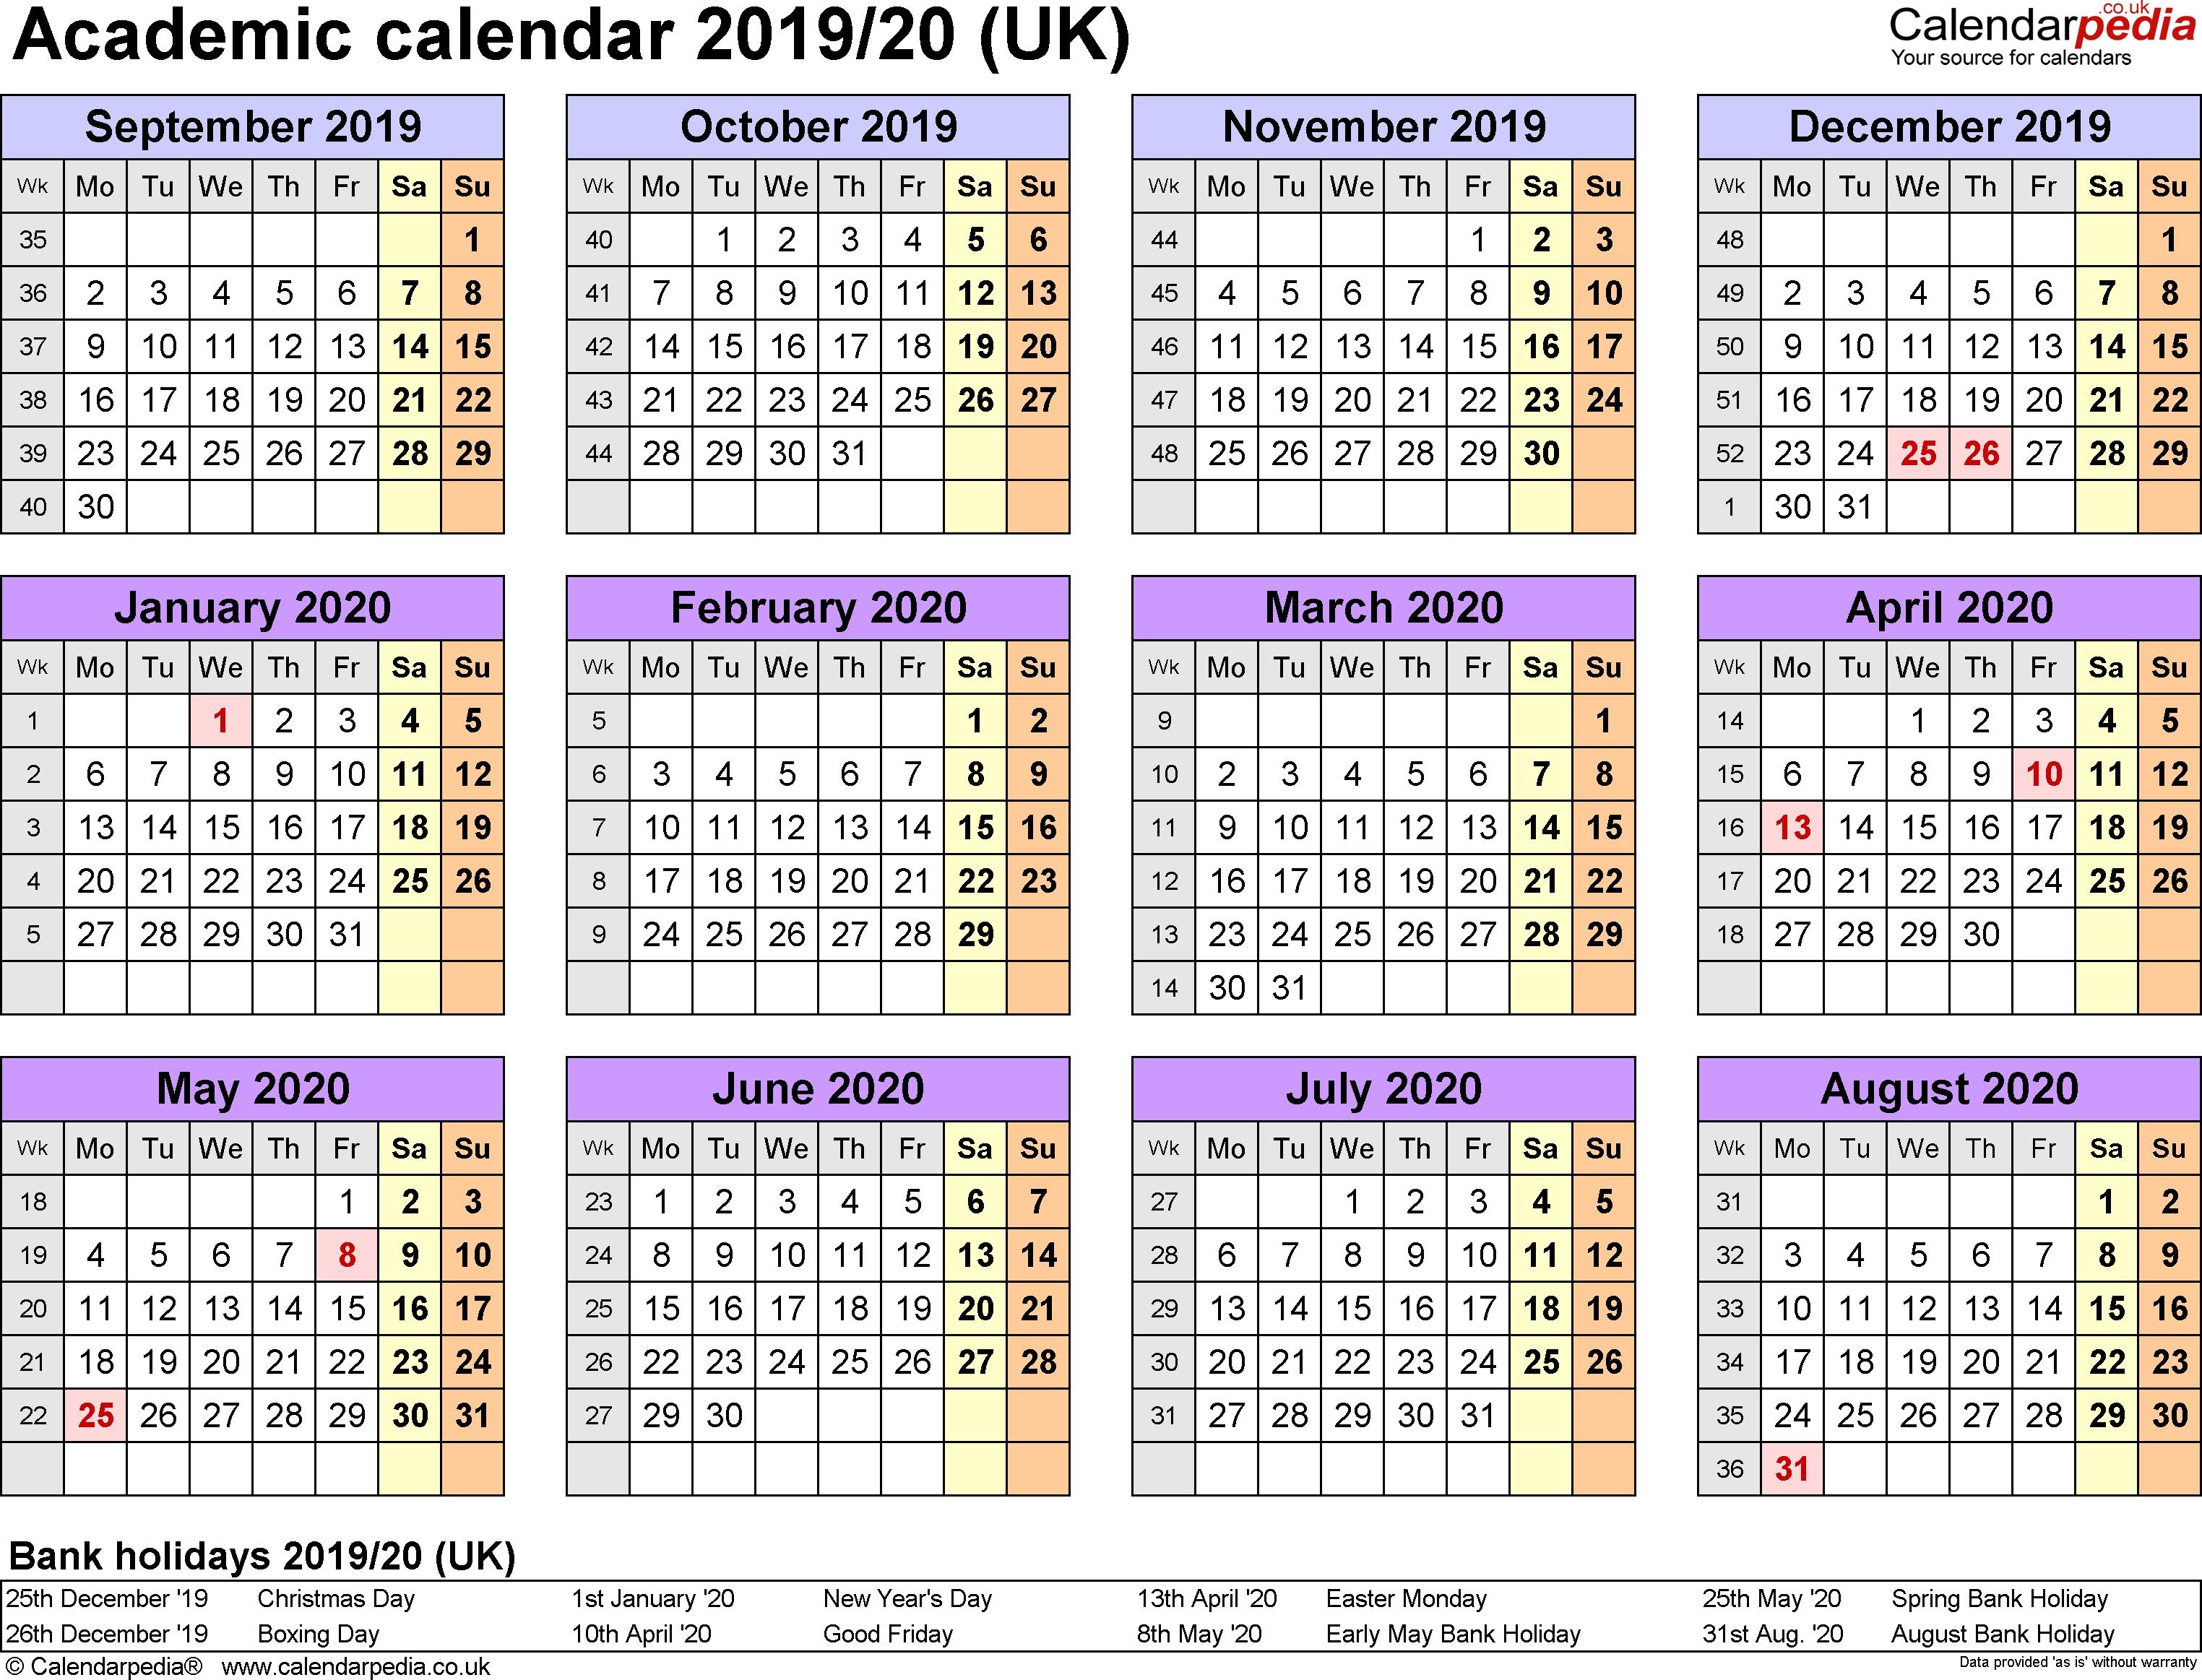 Academic Calendars 2019/2020 As Free Printable Word Templates-Calendar 2020 Printable With Bank Holidays